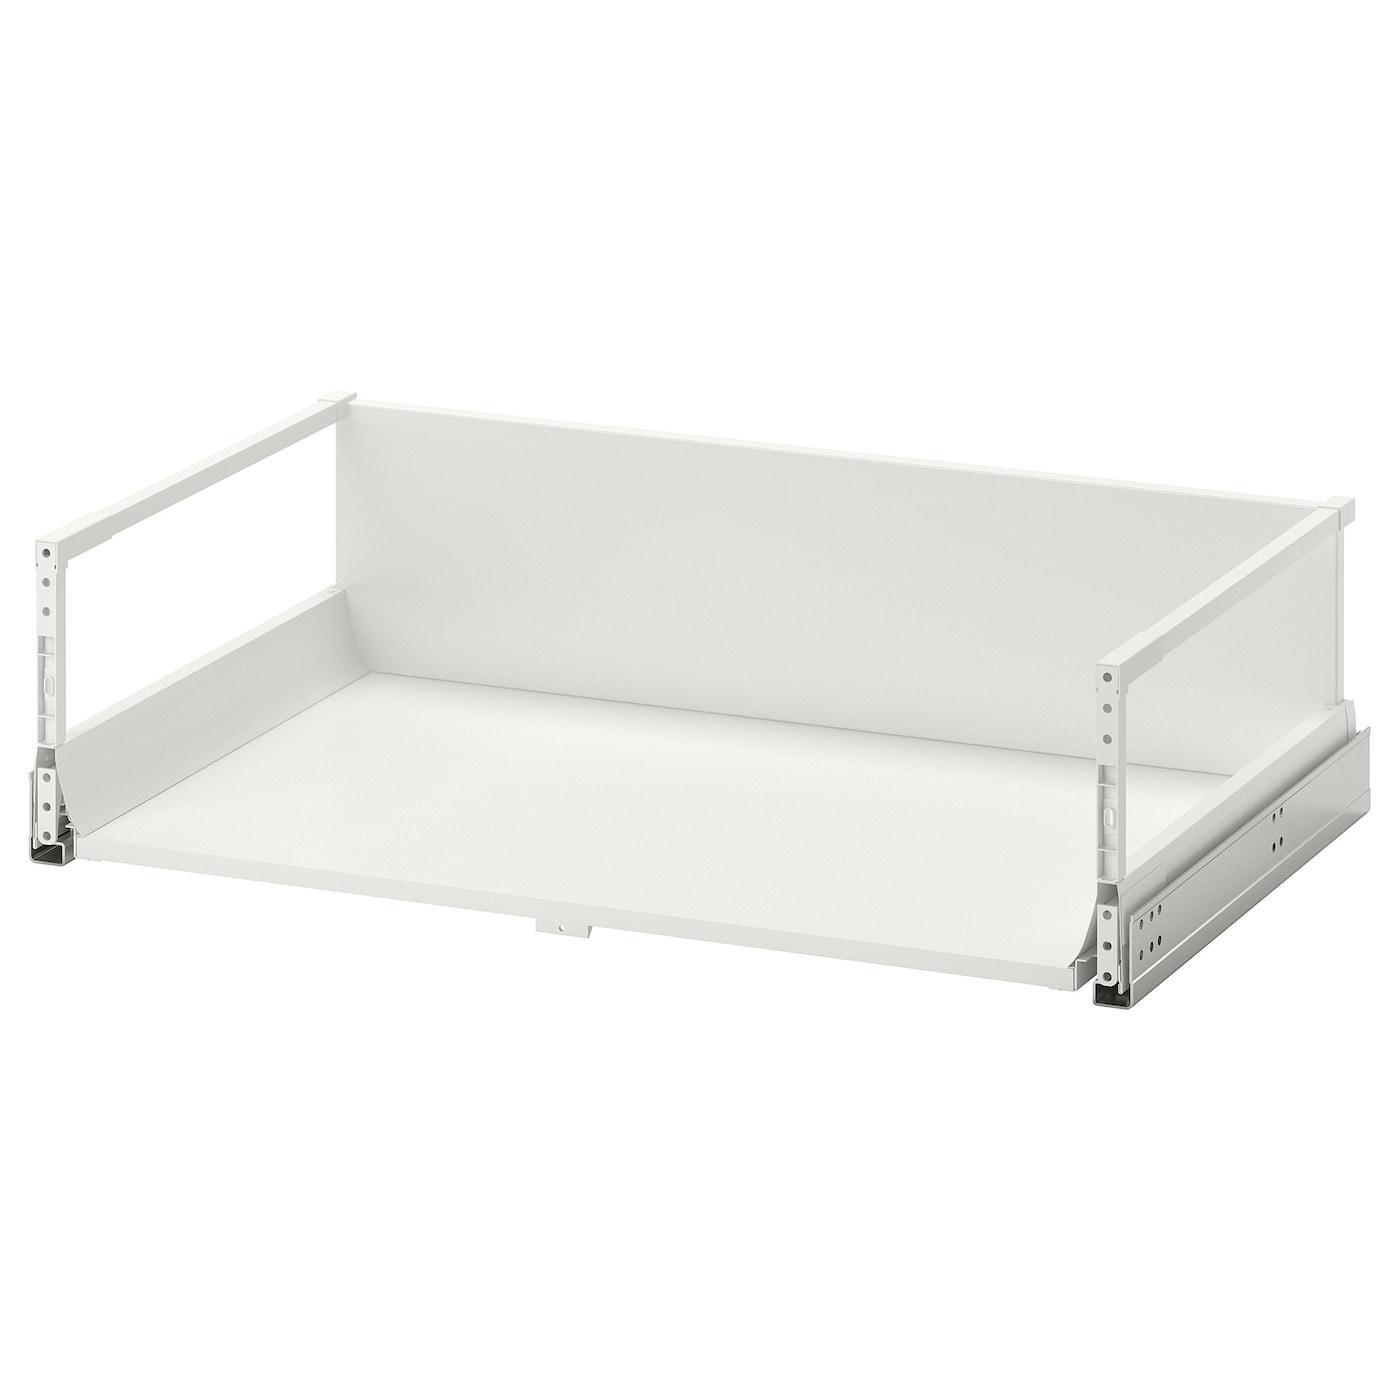 Spiksplinternieuw MAXIMERA Drawer, high - white, 80x45 cm - IKEA VF-15